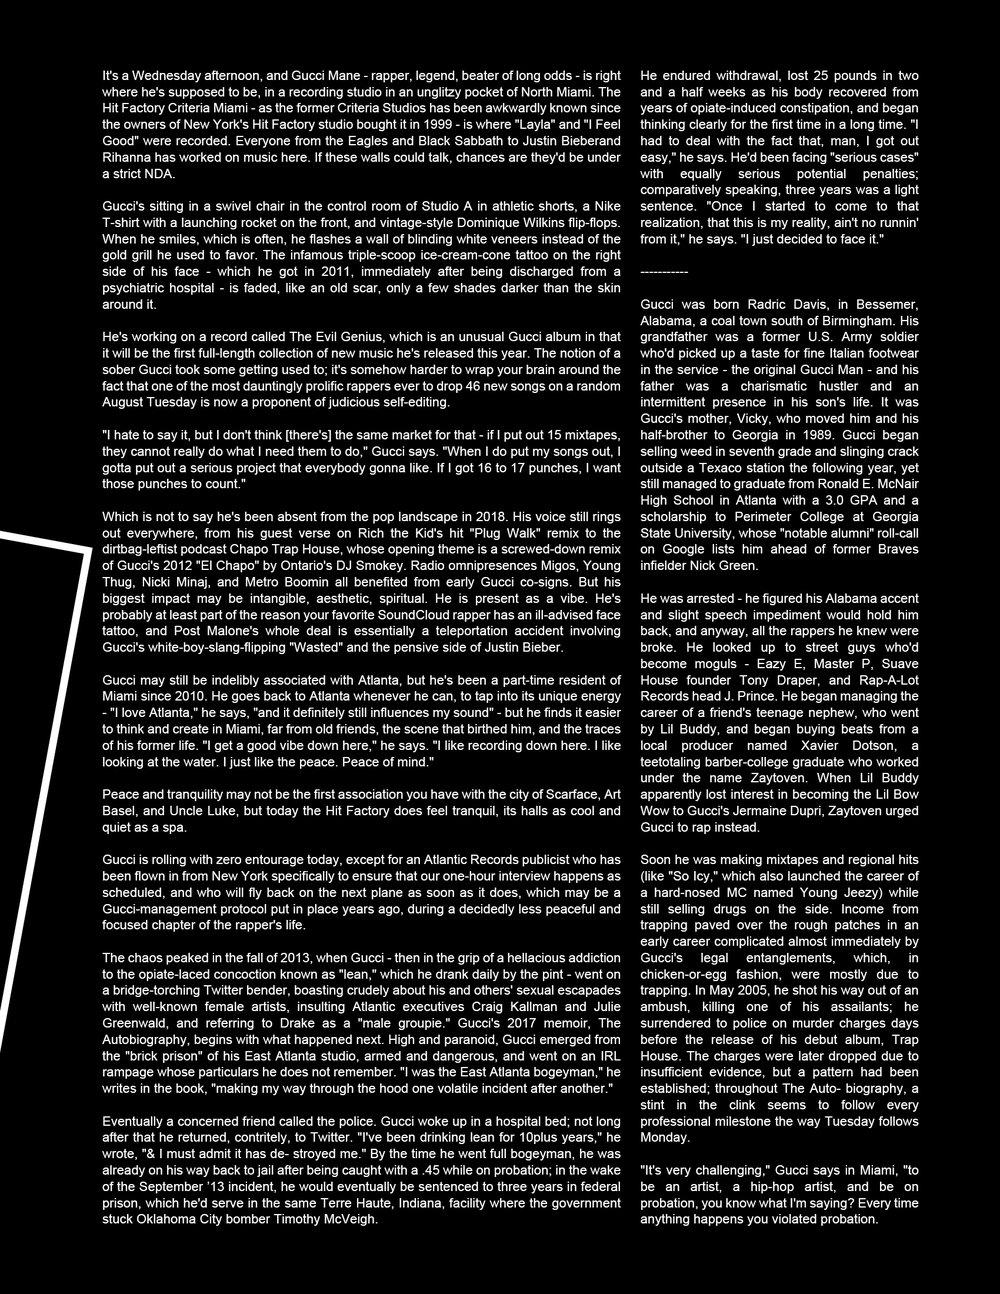 RockLan One Magazine - Gucci Mane